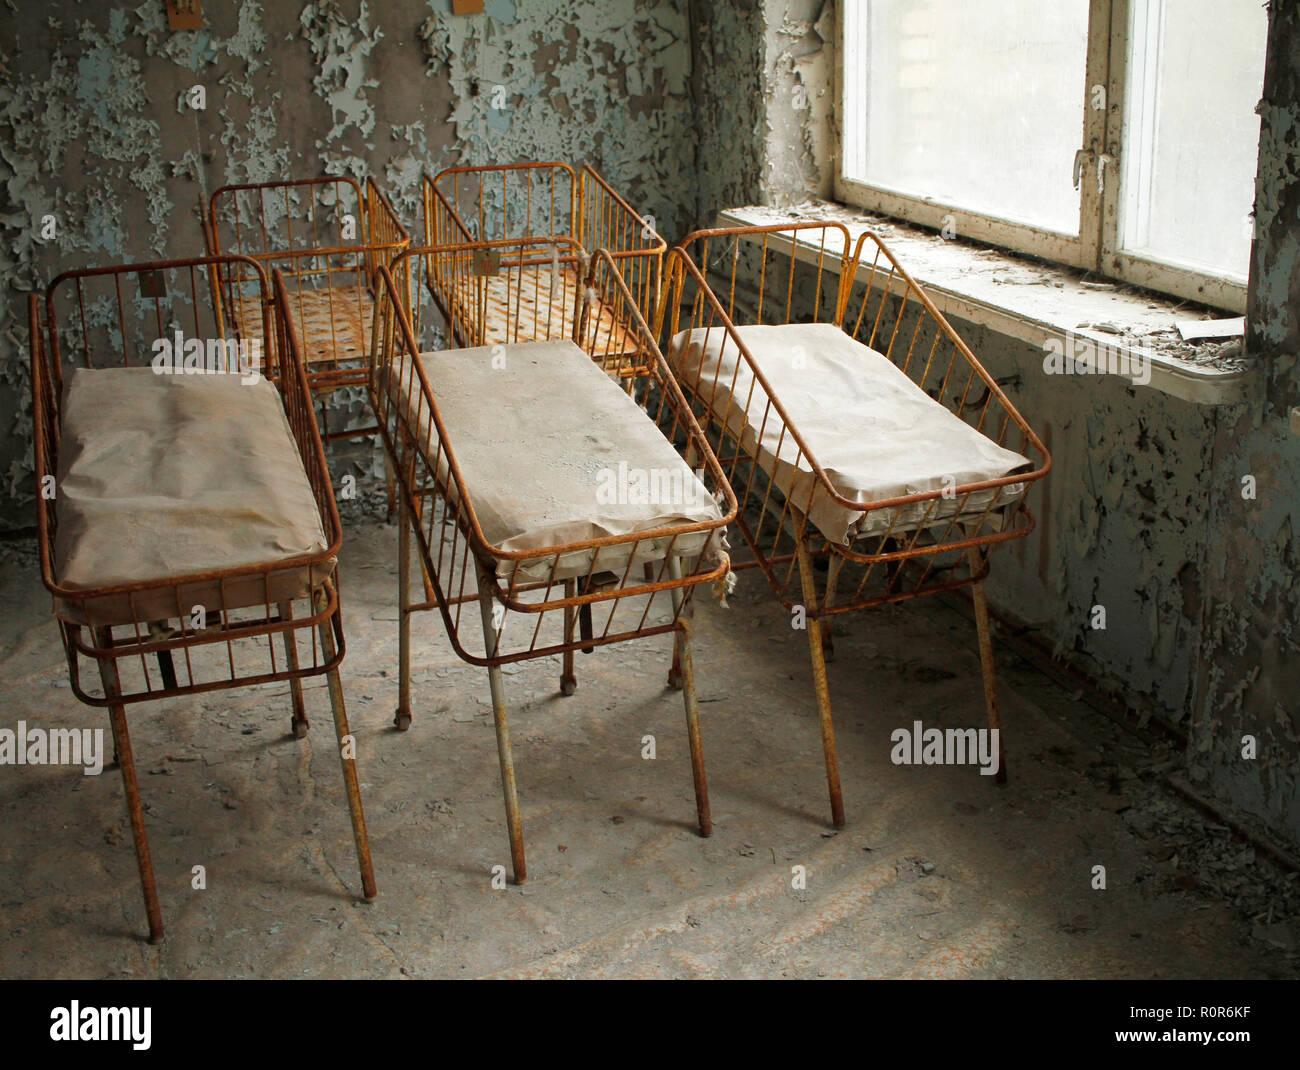 Nursery beds for newborn babies in deserted hospital in Pripyat, Chernobyl Exclusion Zone, Ukraine. - Stock Image